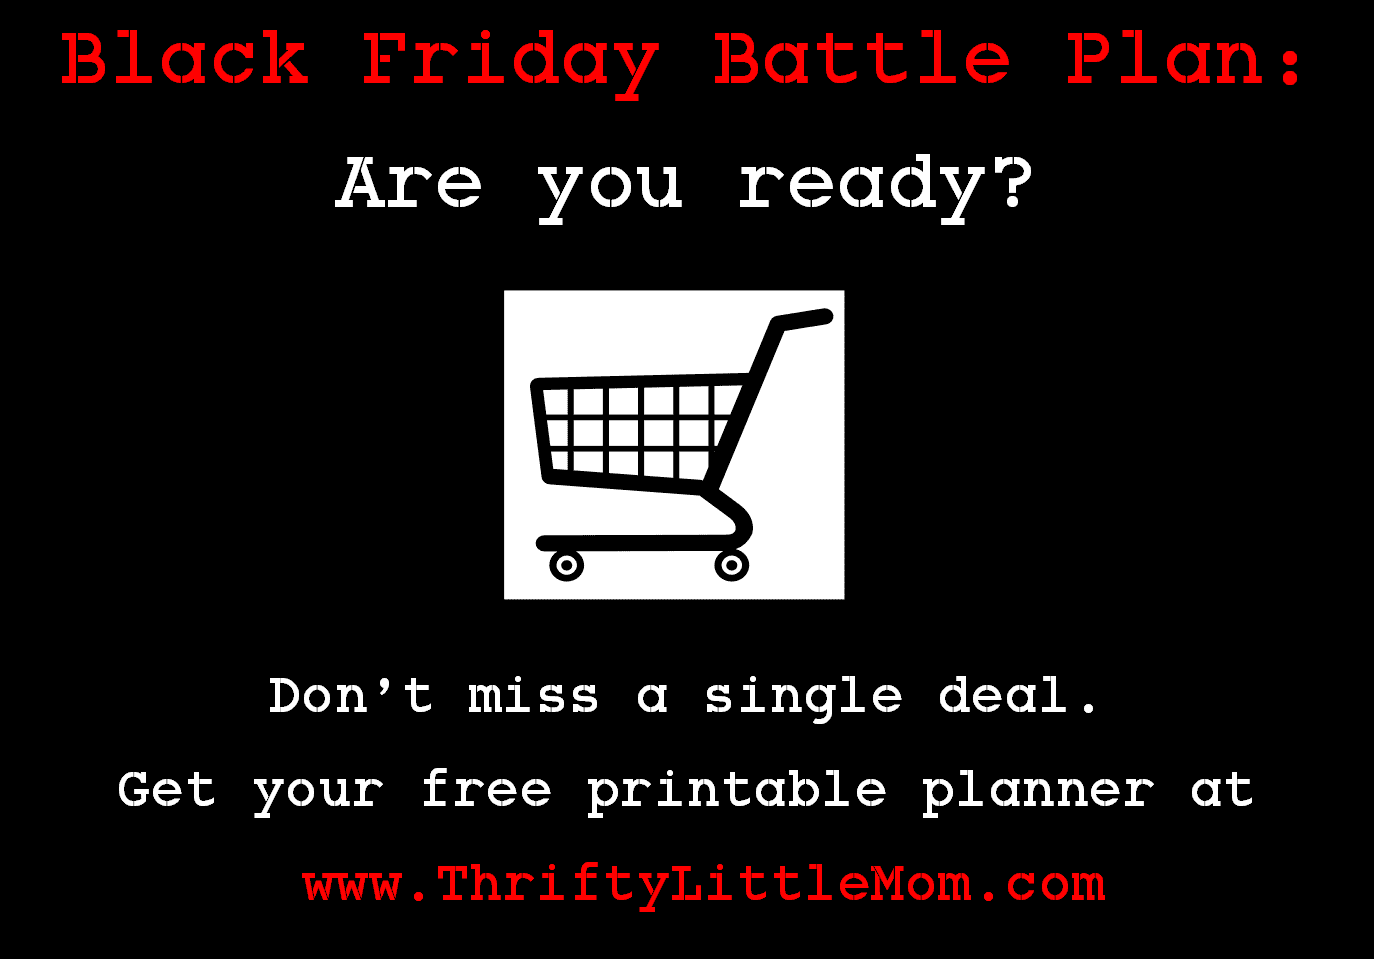 Black Friday Shopping List & Battle Plan